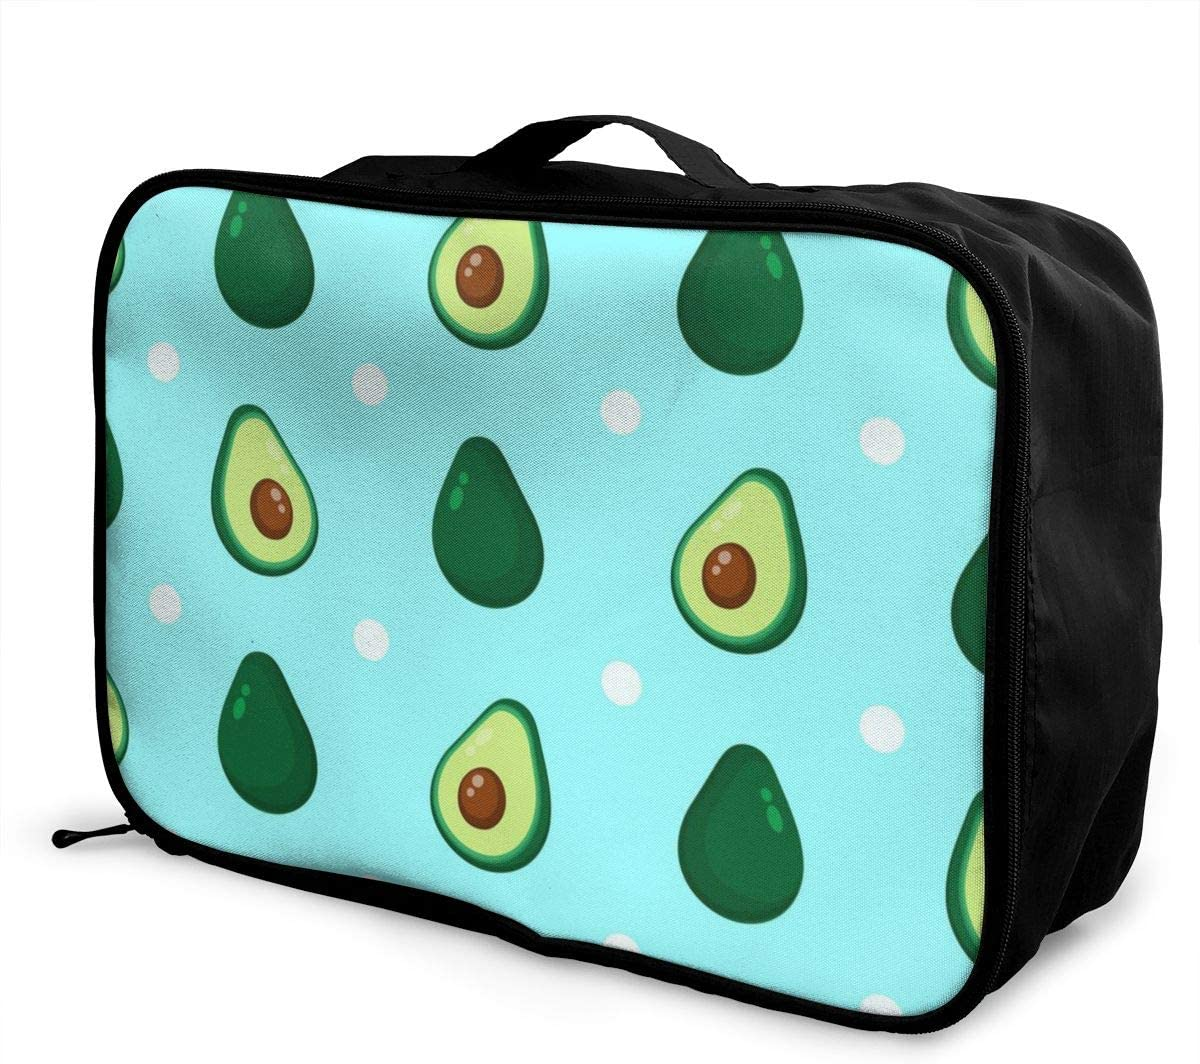 Yunshm Cute Avocado Dotted Customized Trolley Handbag Waterproof Unisex Large Capacity For Business Travel Storage